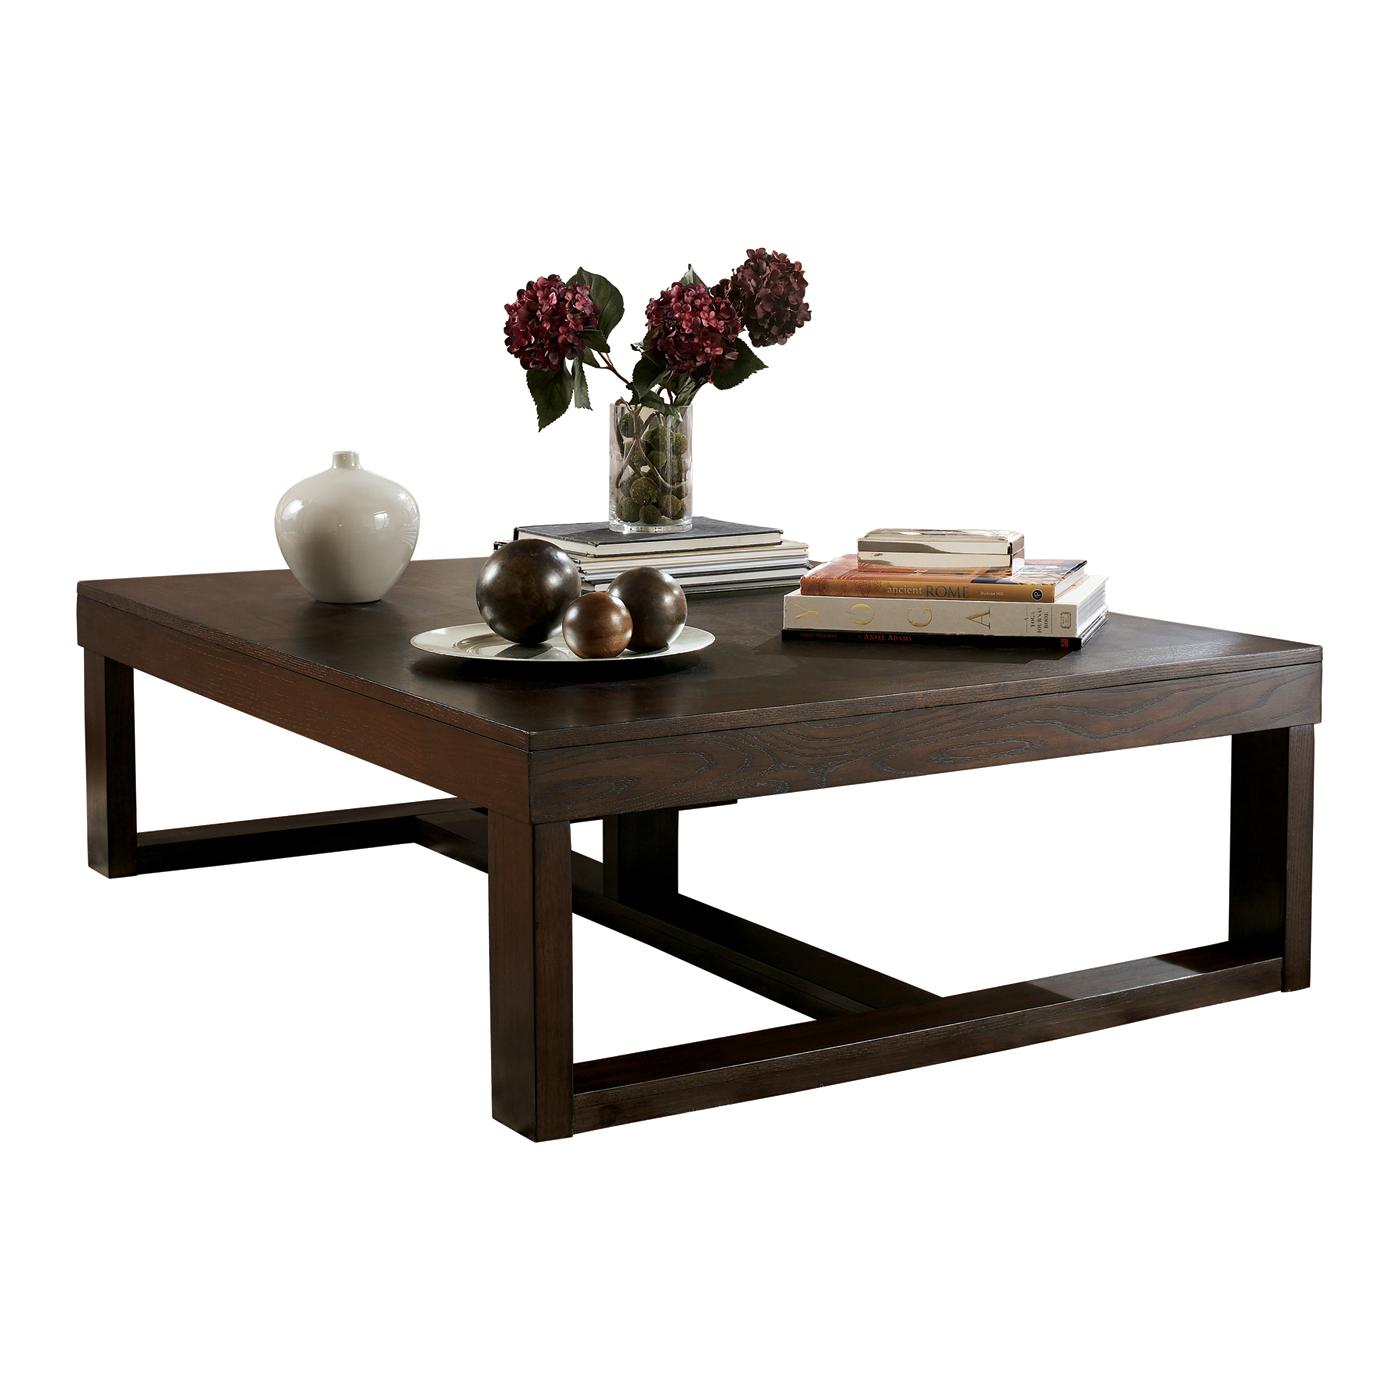 coffee table fella design photo - 4